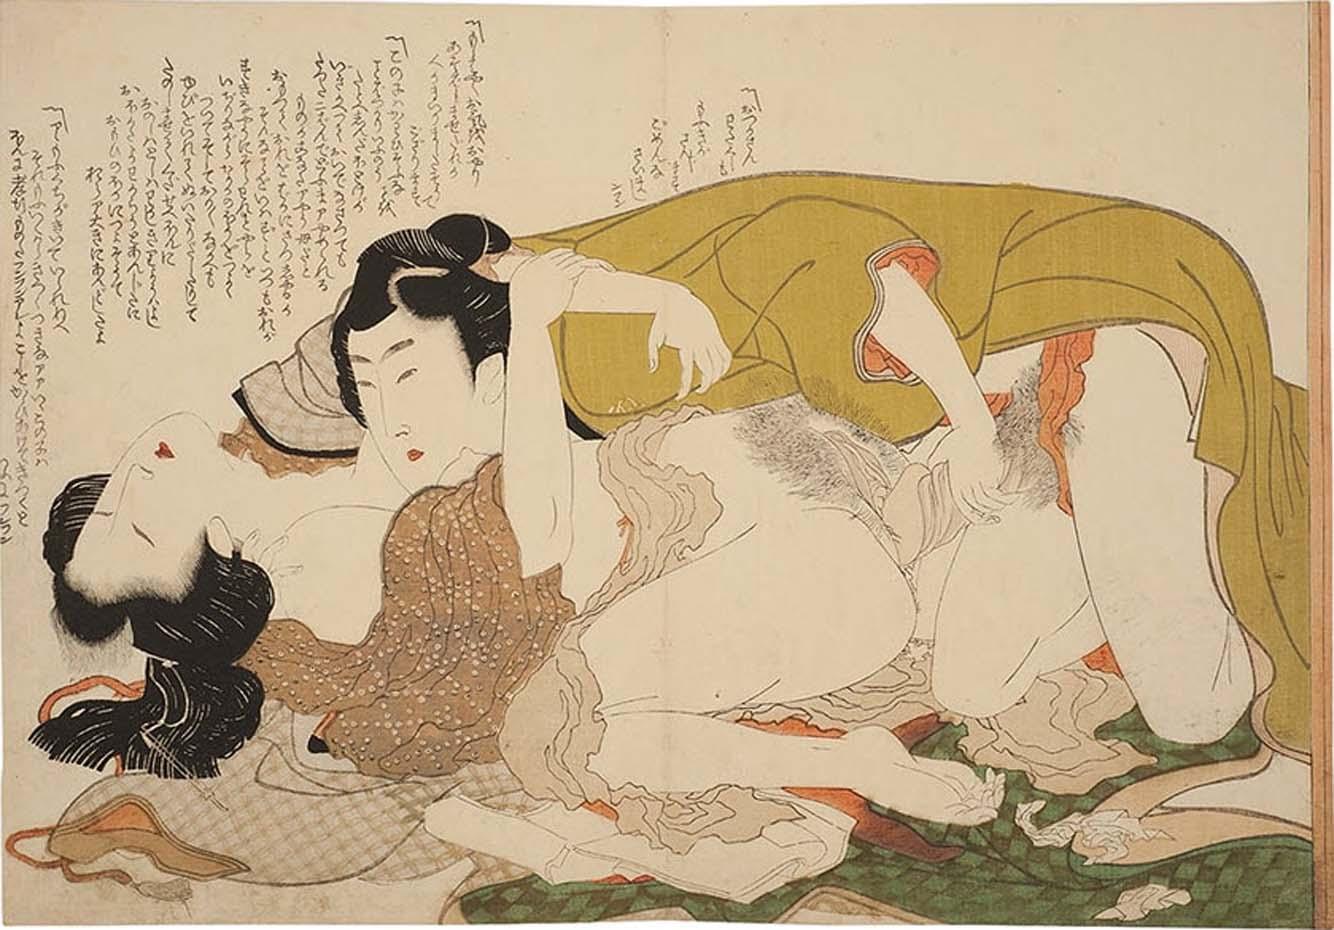 Кацусика Хокусай (Katsushika Hokusai), Двое в спальне